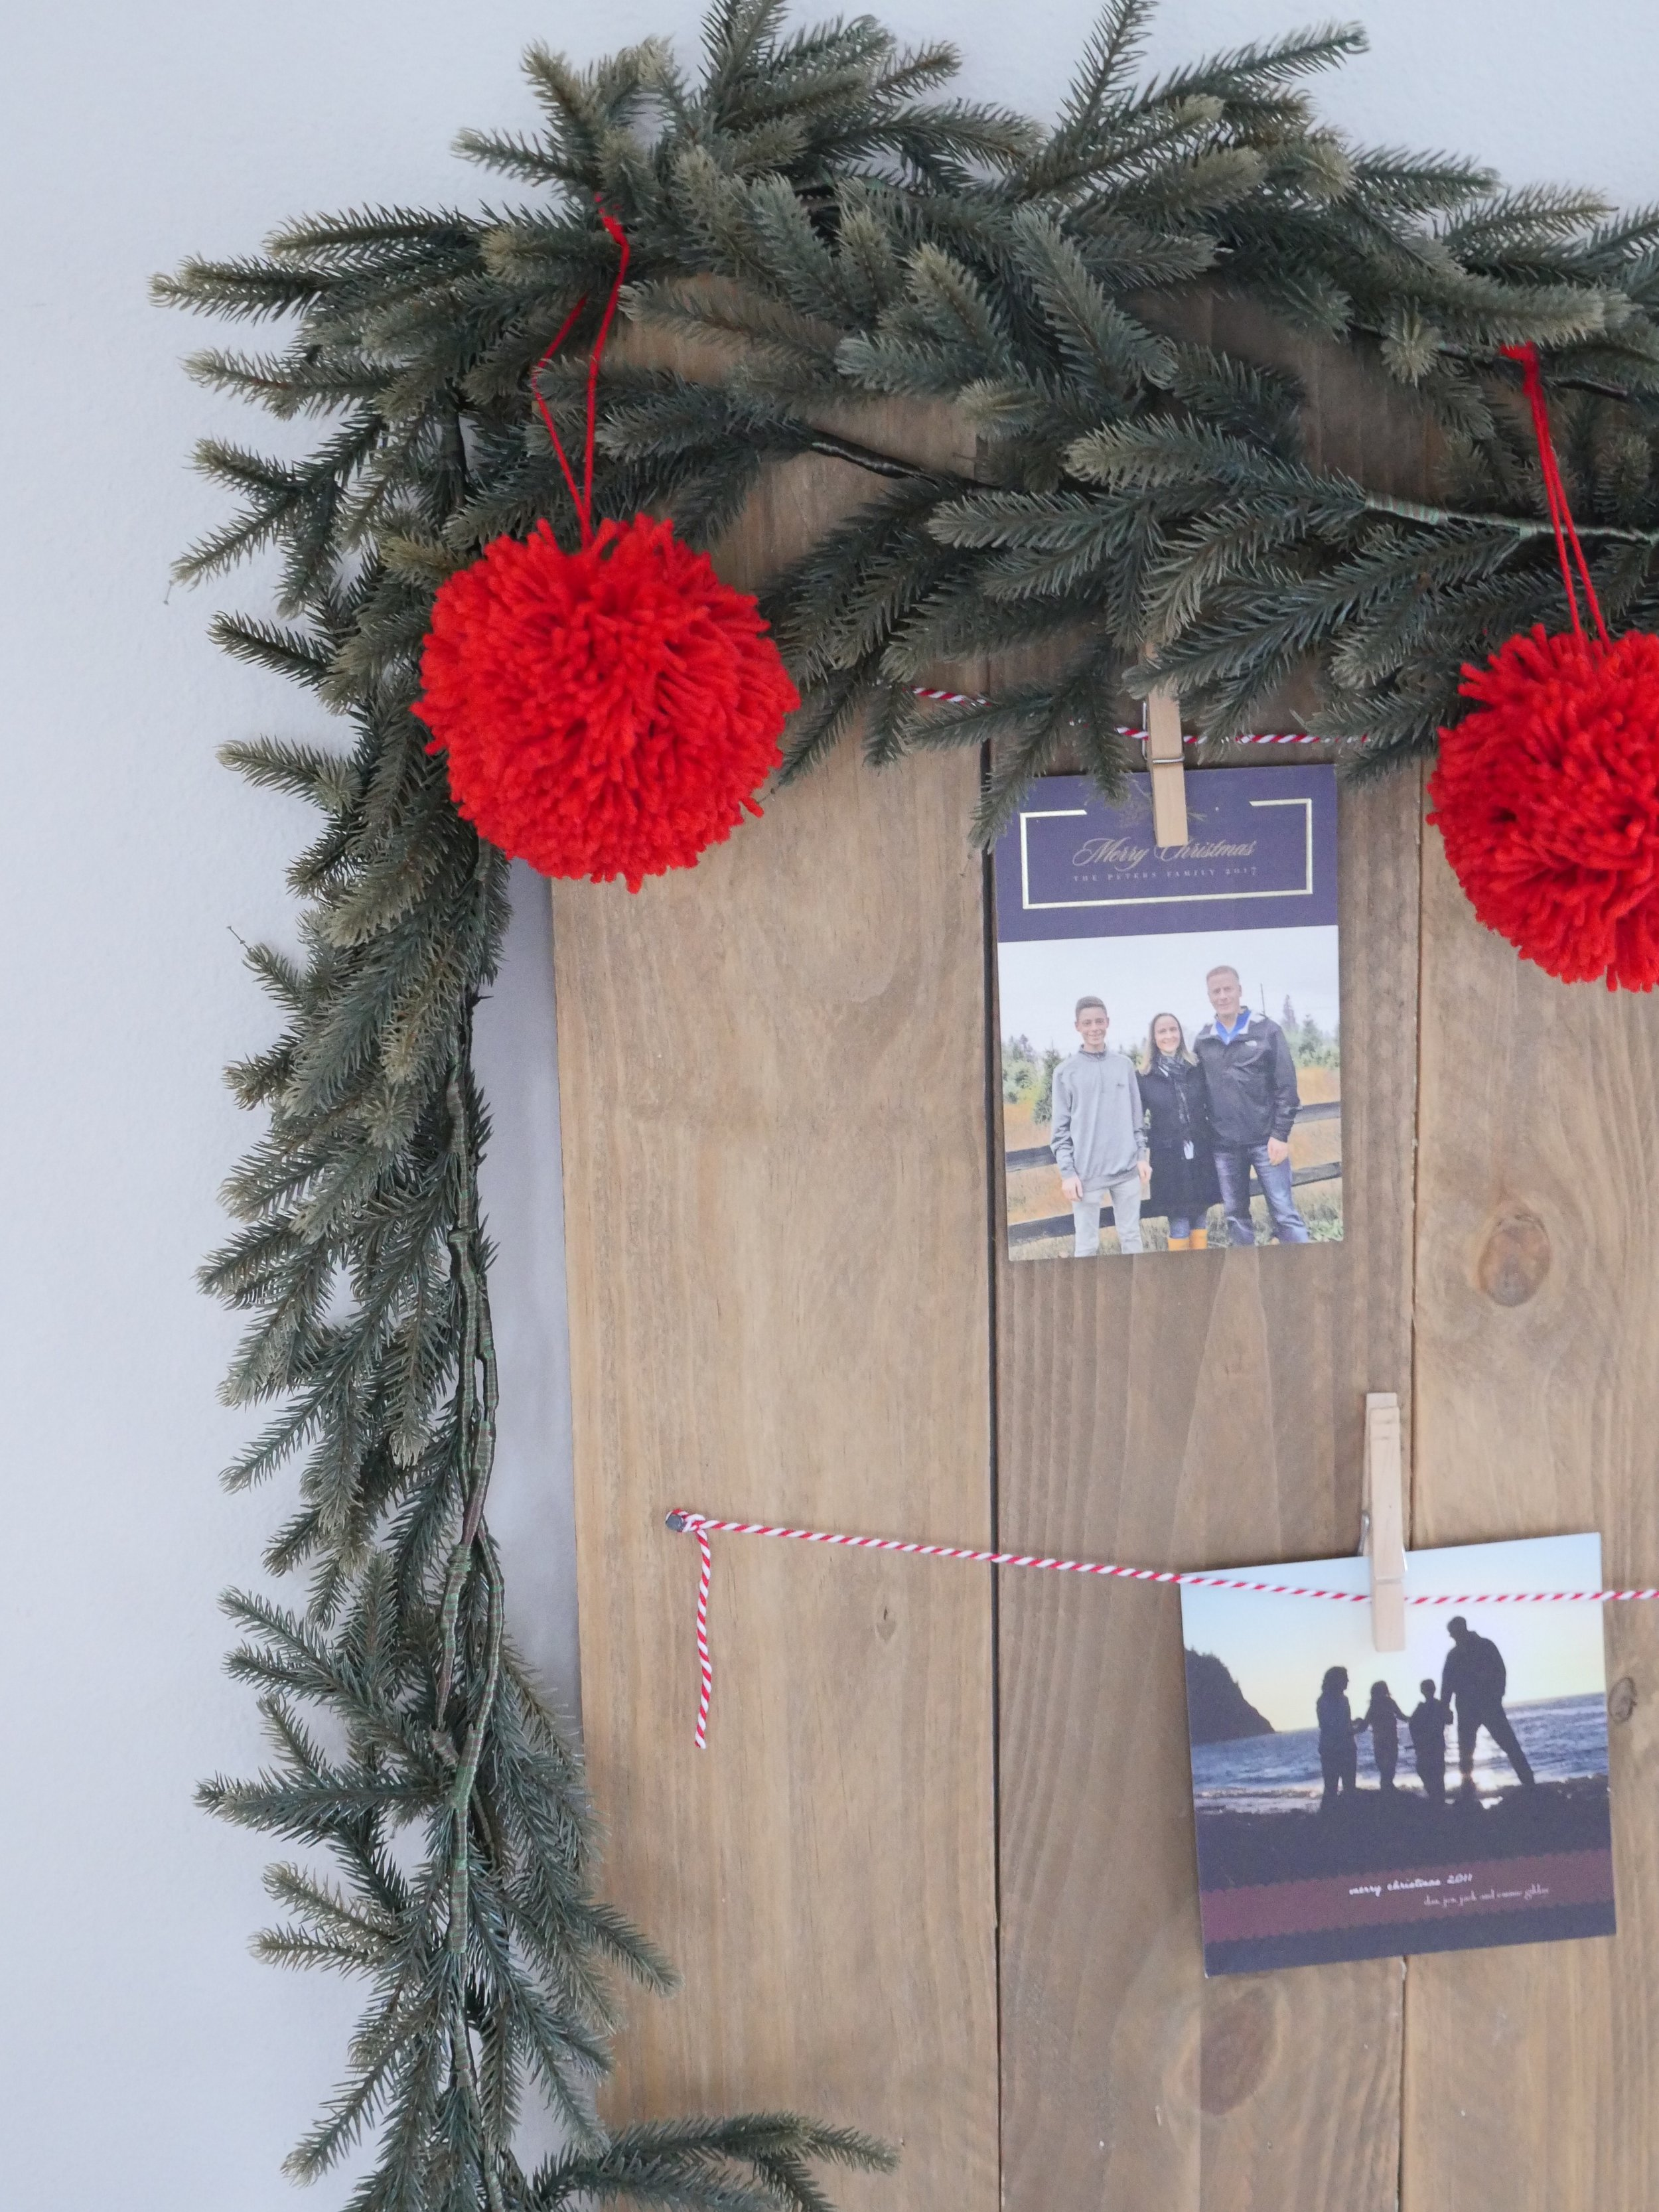 Jen Gilday Interiors - Christmas Card Display Board Tutorial